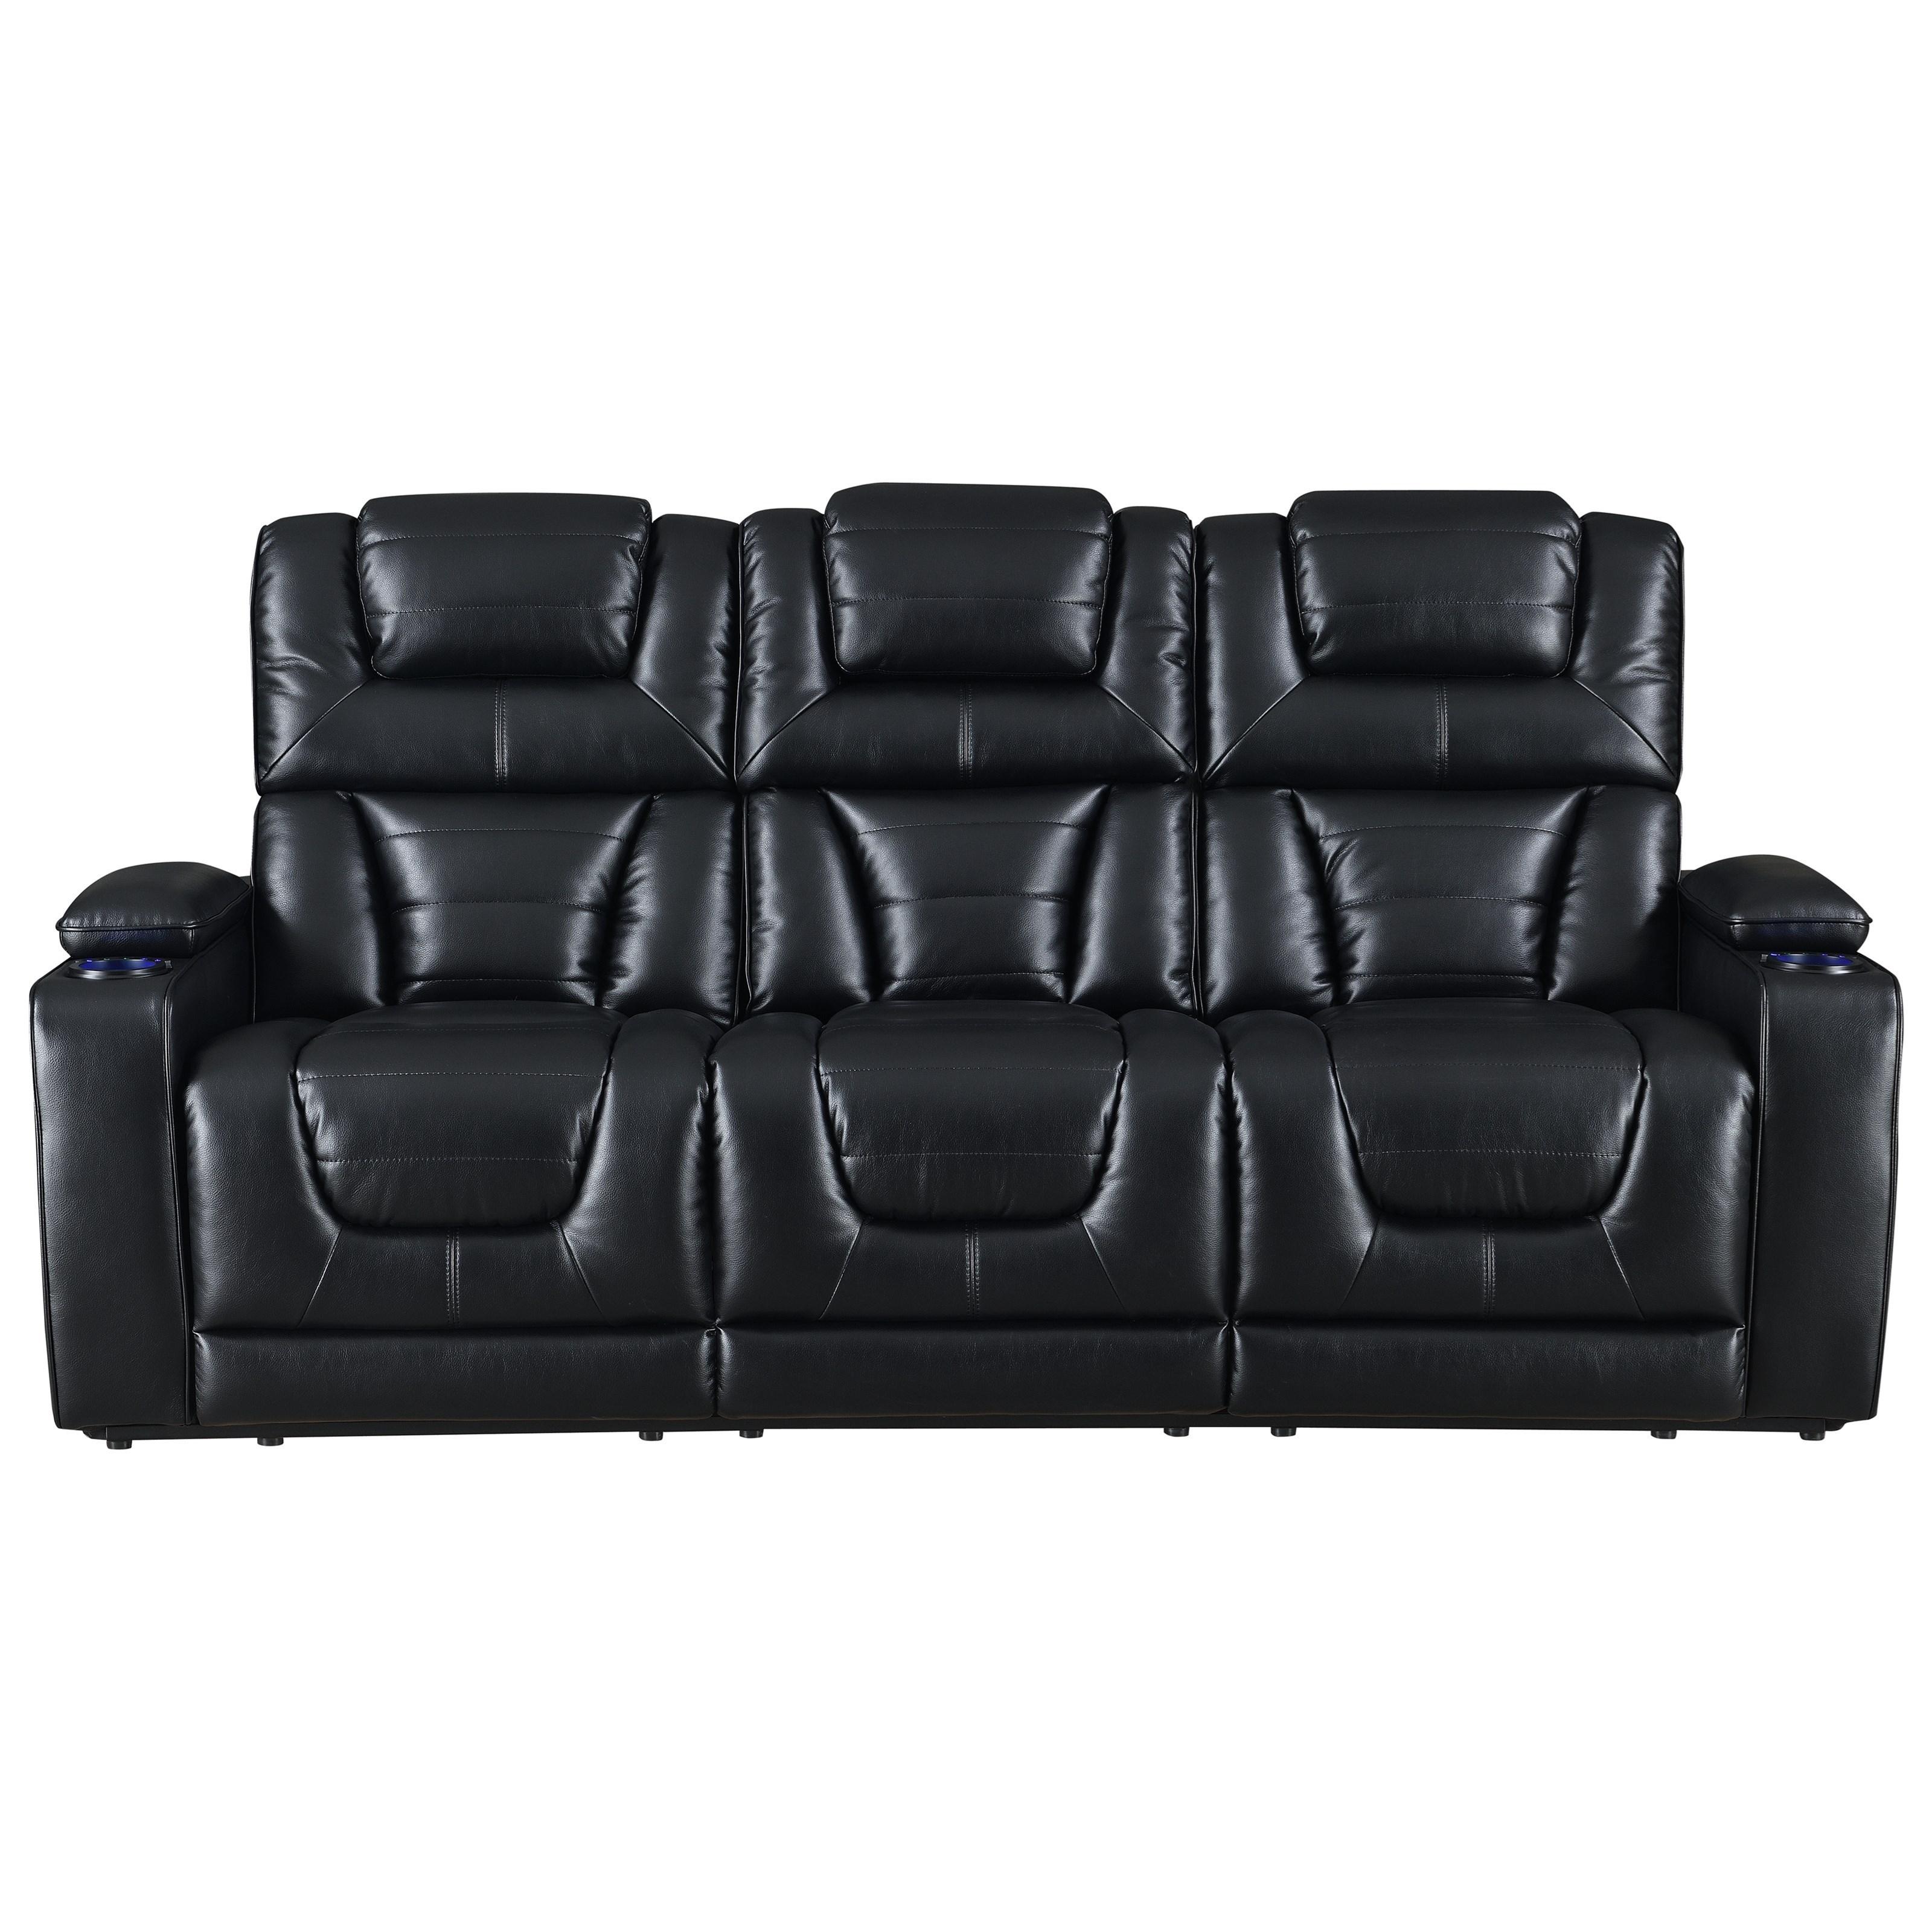 U1877 Pwr Recline Sofa w/ Pwr Head & DD Table by Global Furniture at Dream Home Interiors